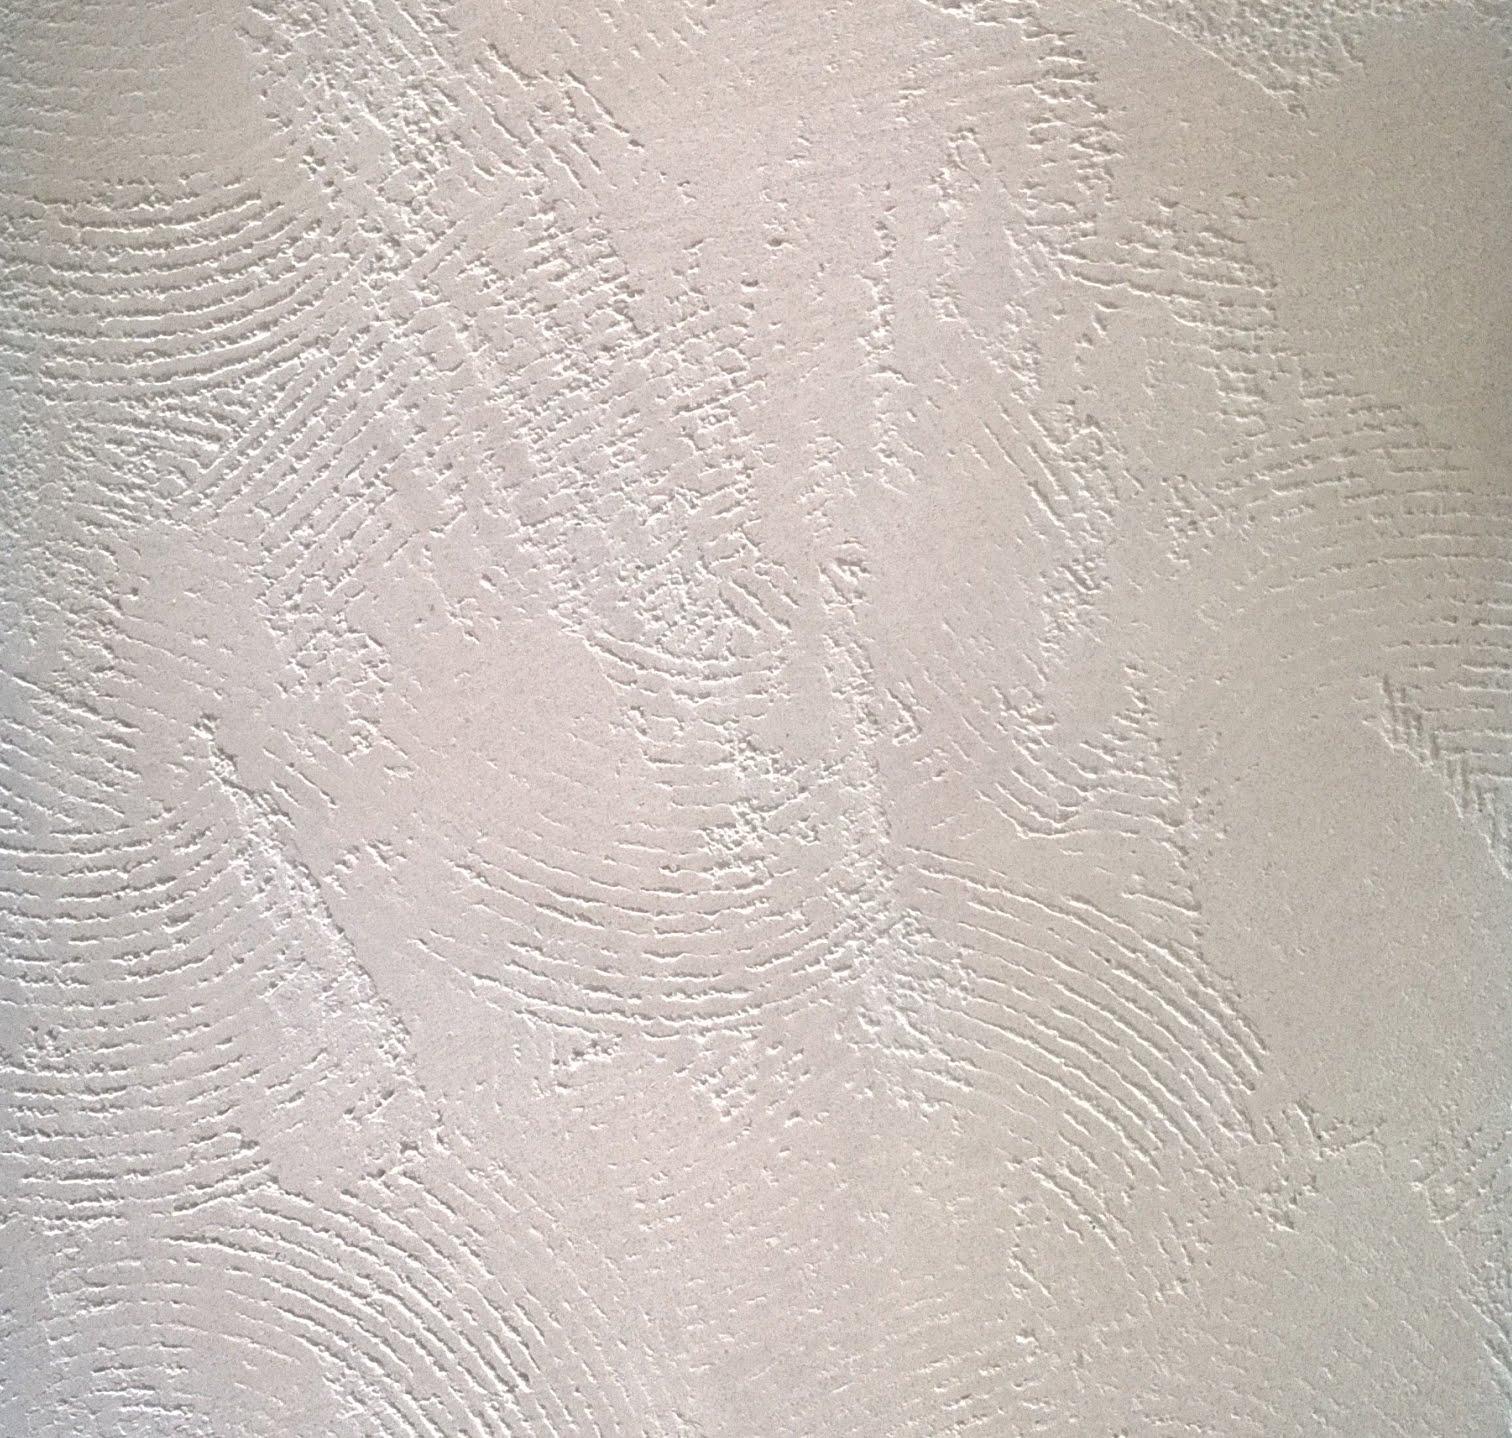 Listino prezzi pitture decorative pitture materiche per - Pitture decorative per pareti ...